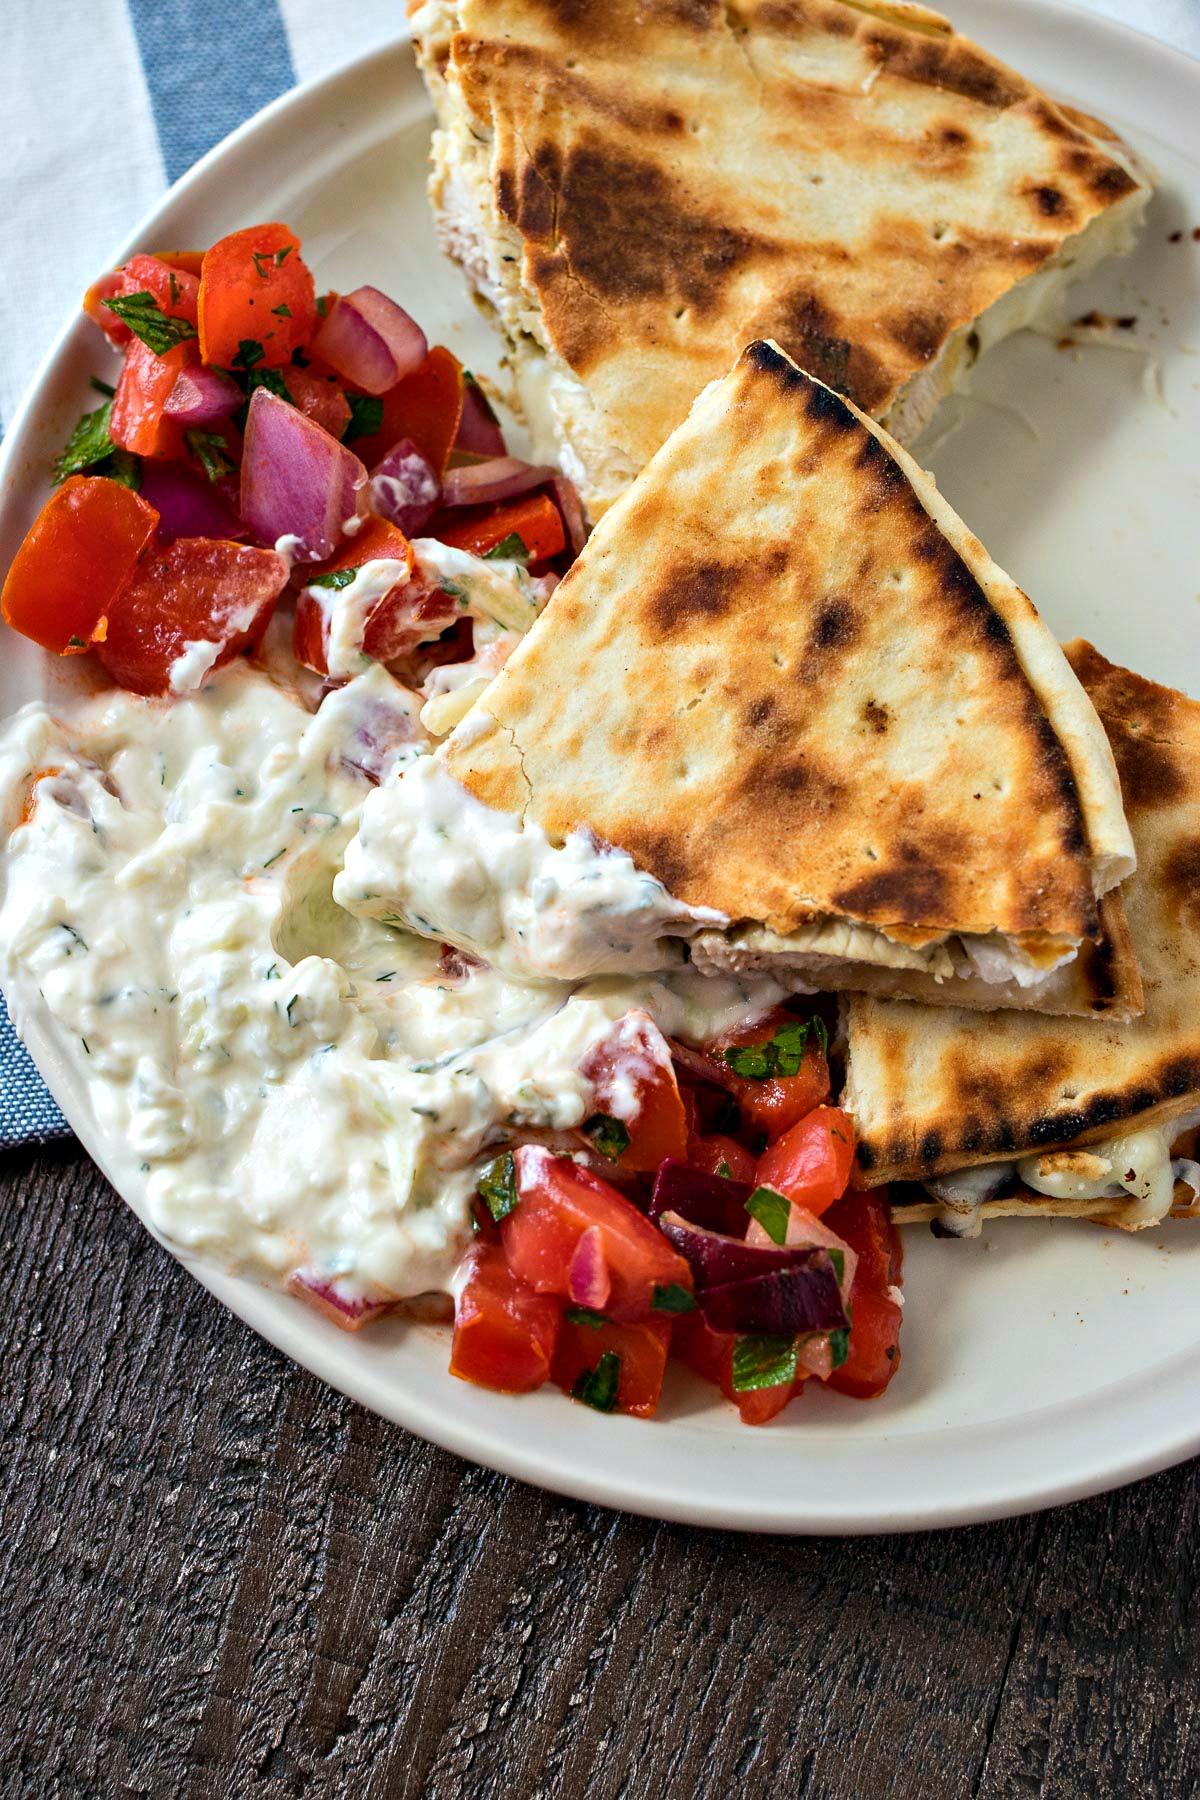 greek chicken quesadilla dipped in tzatziki sauce